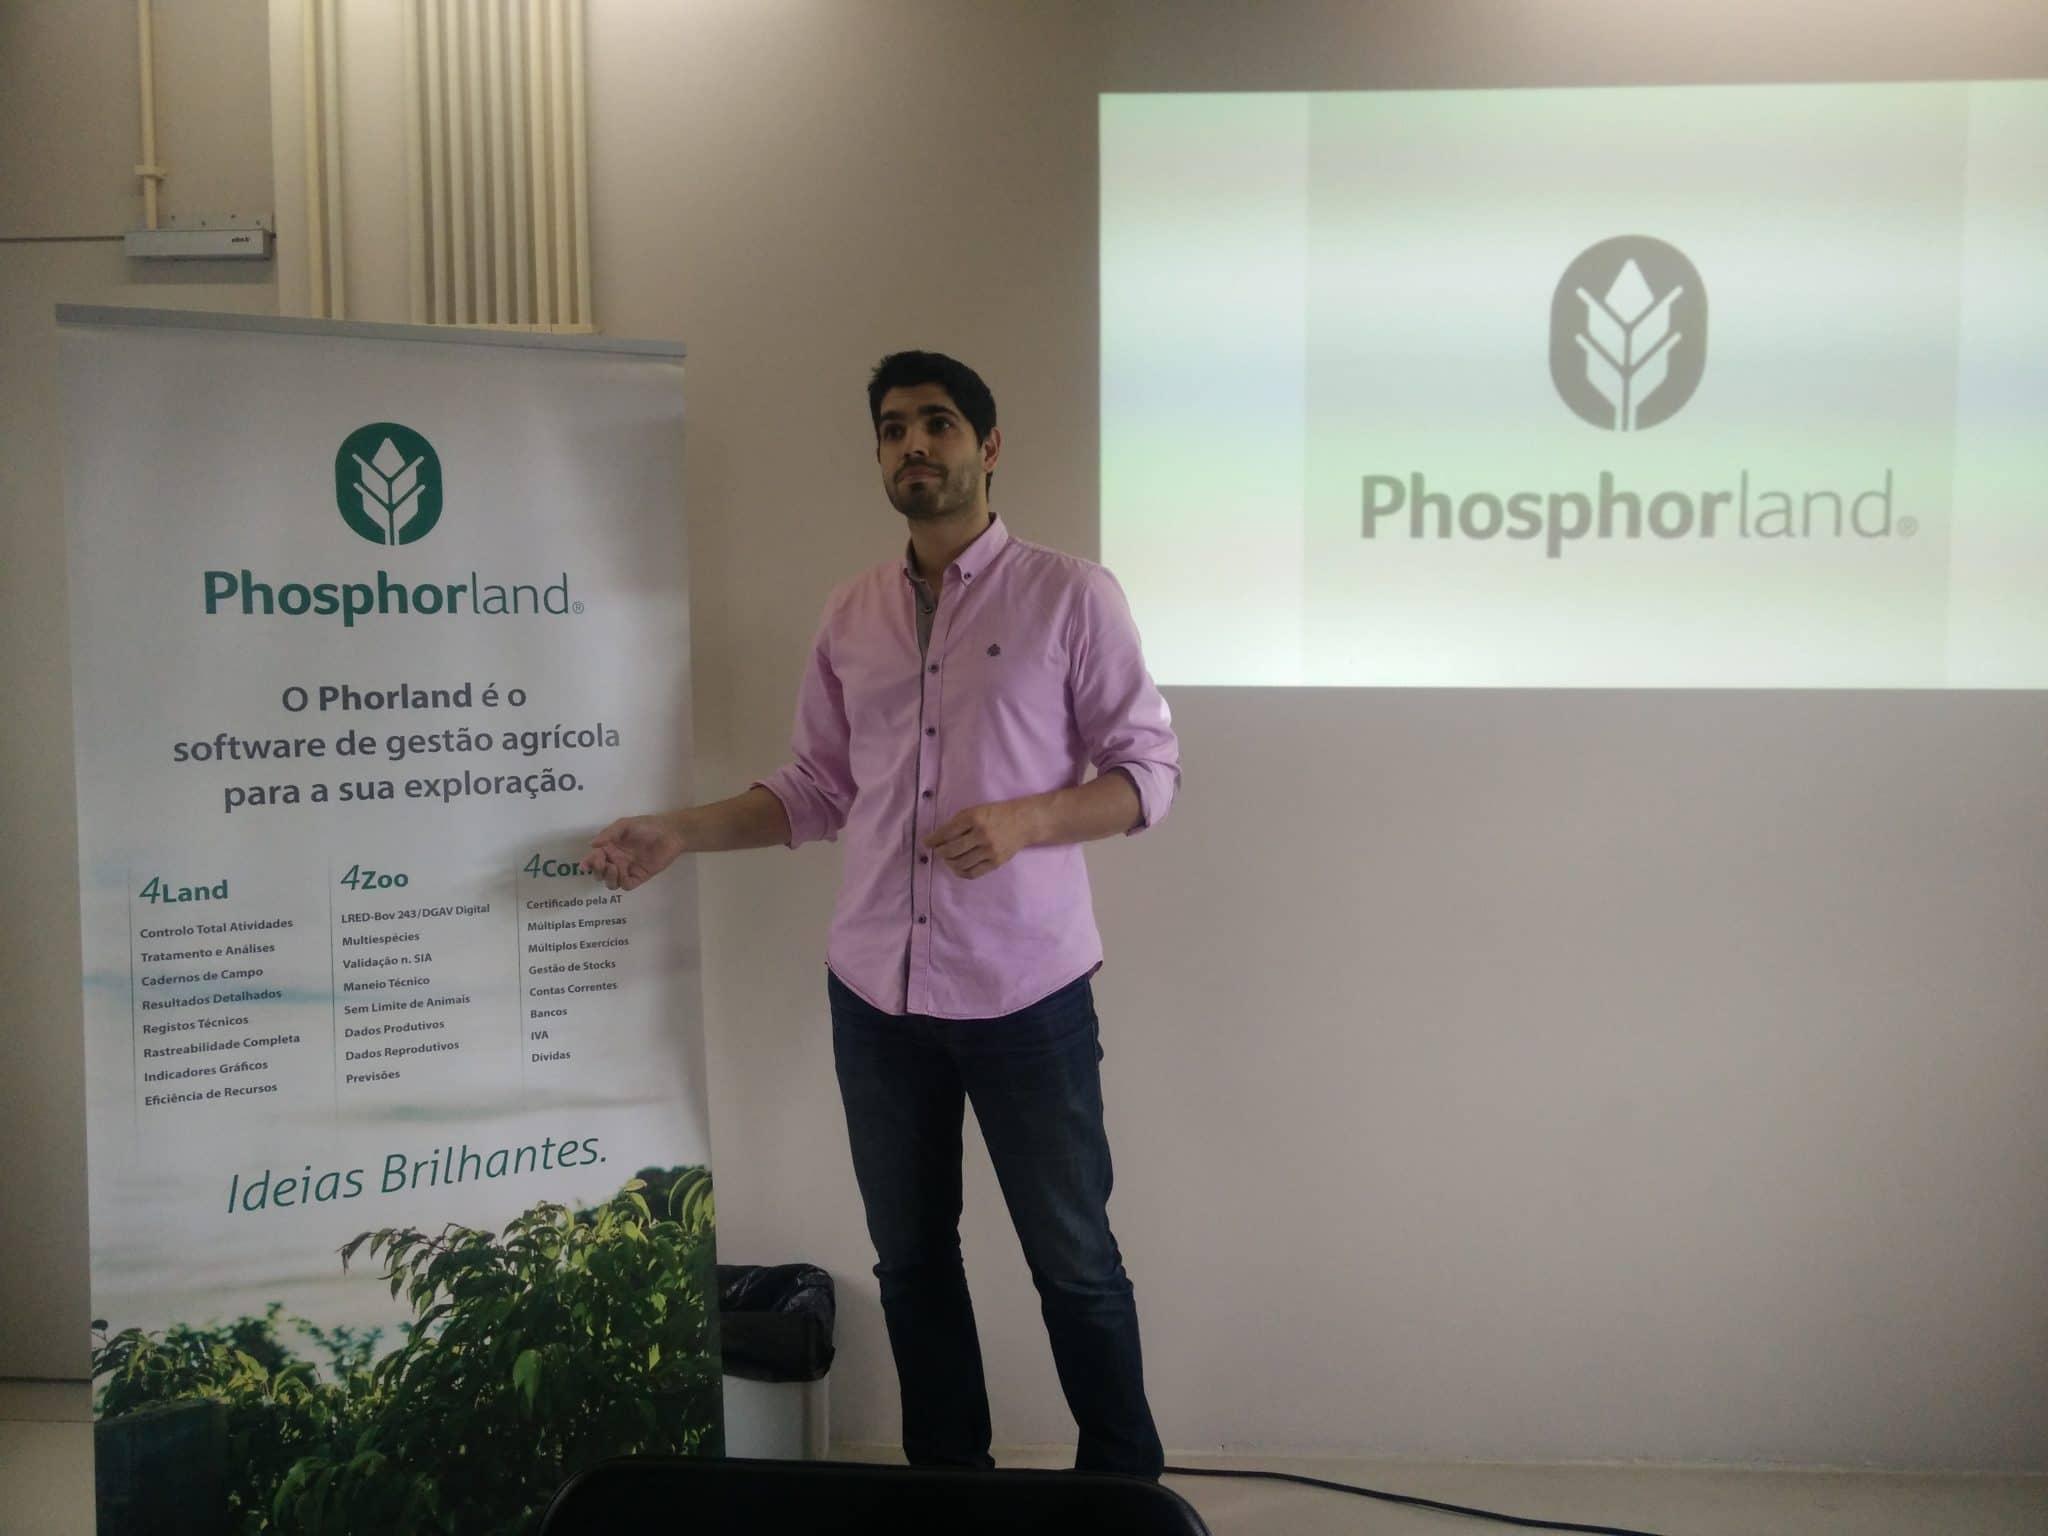 Raul Pinheiro Phosphorland